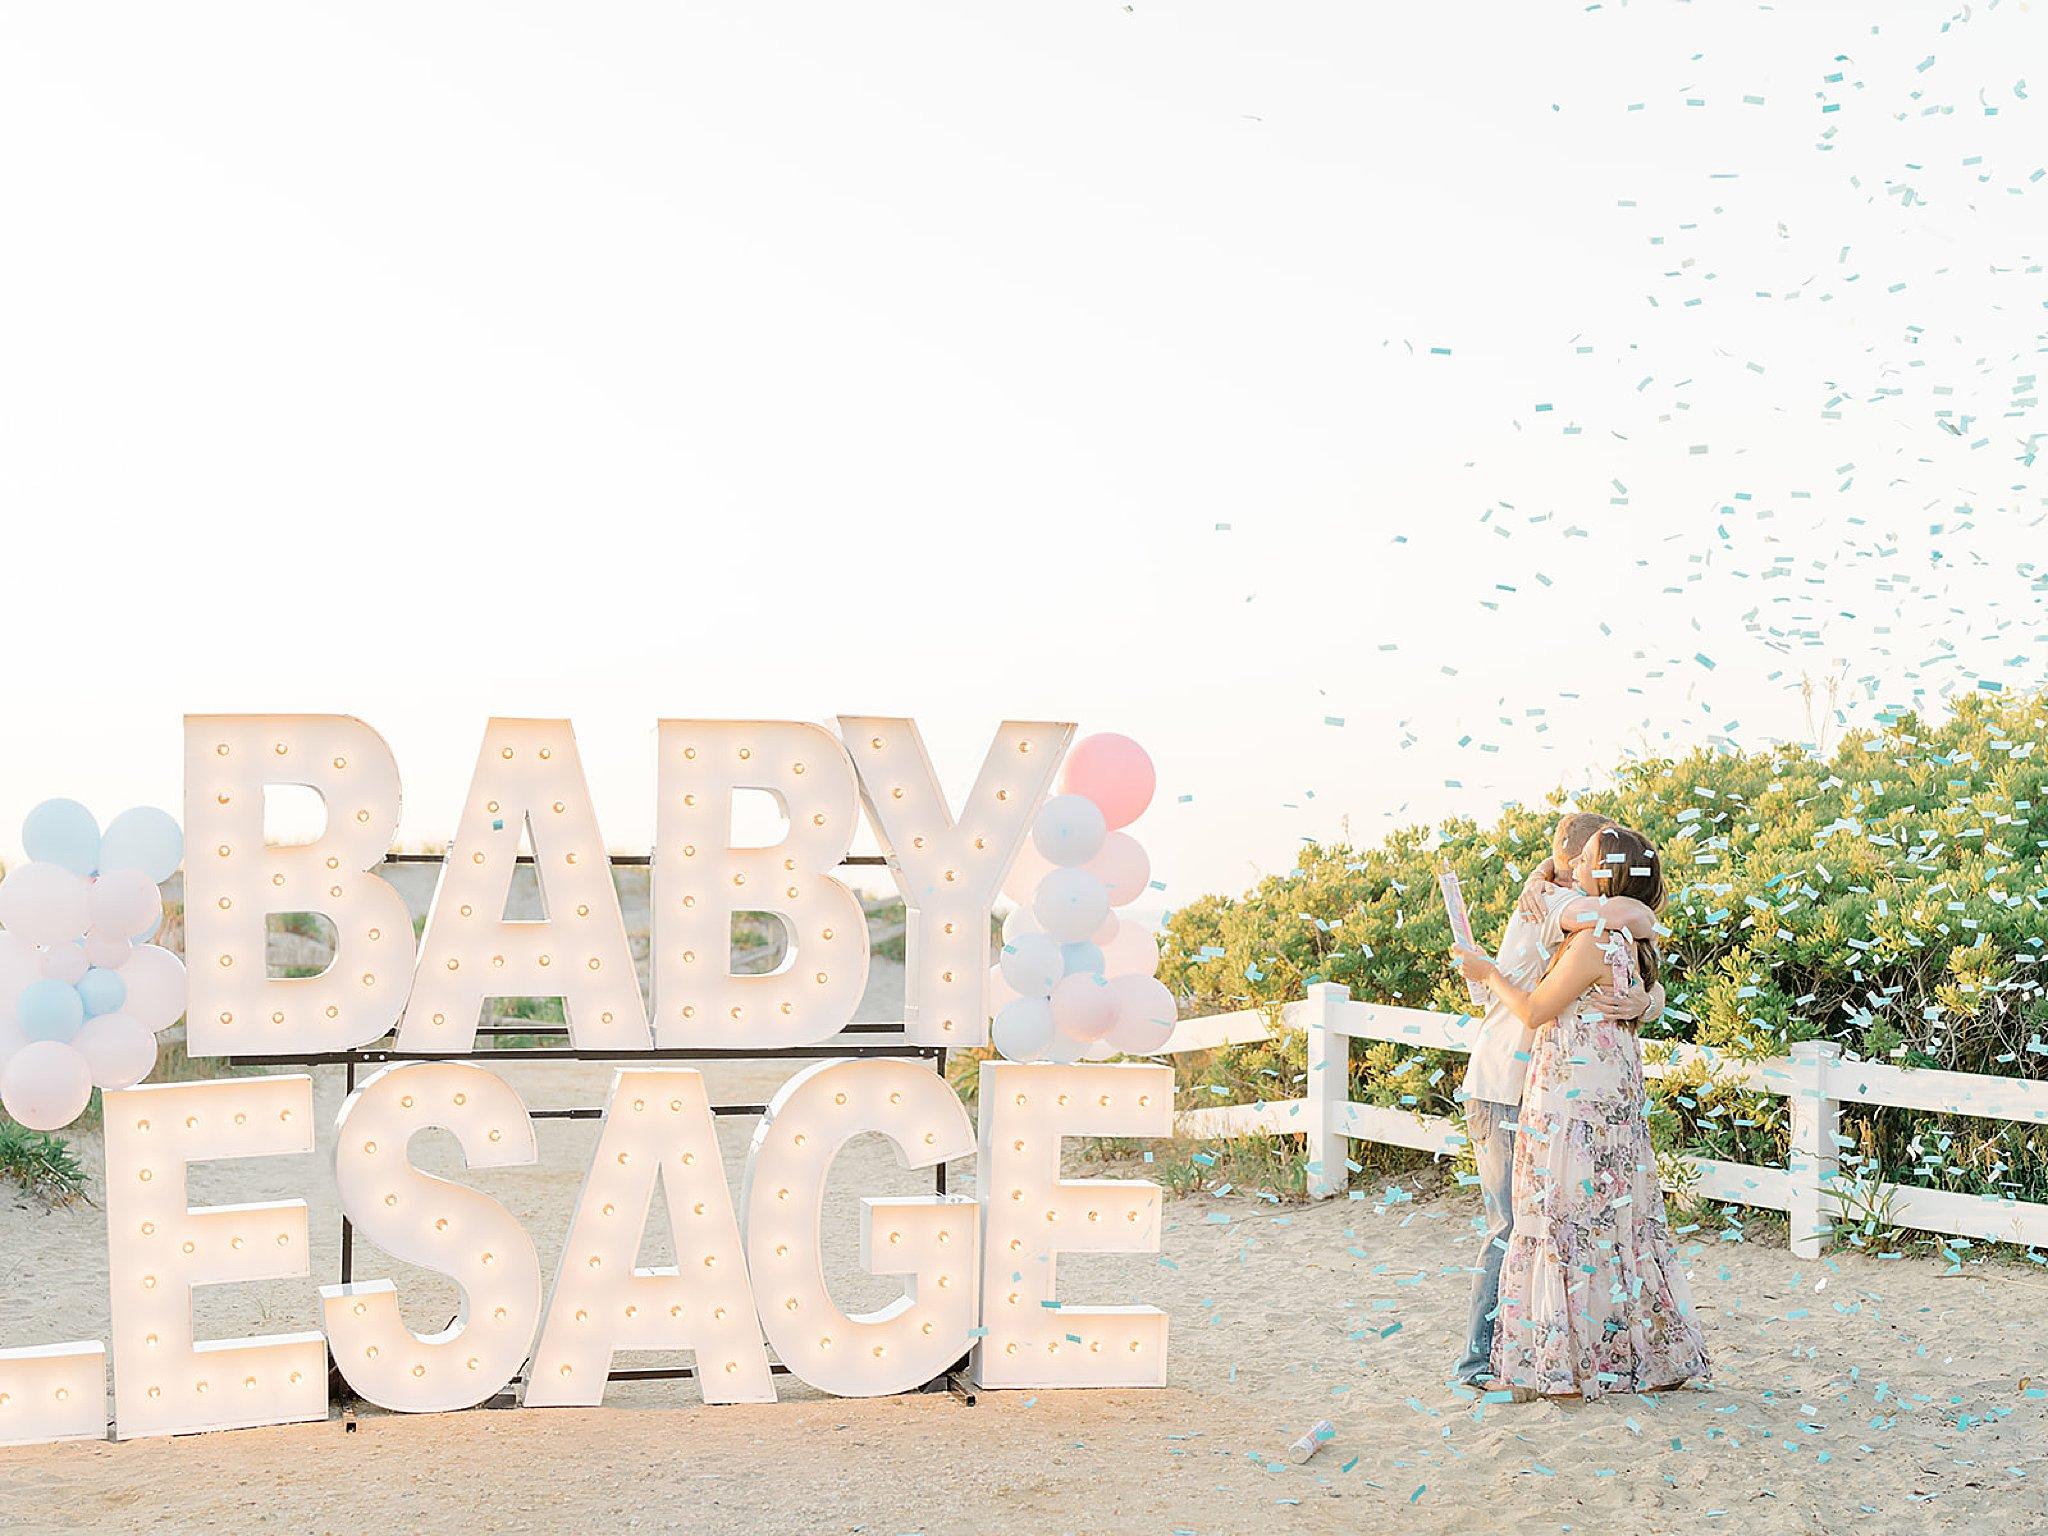 Ocean City NJ Gender Reveal Pregnancy Photography by Magdalena Studios 0008 1